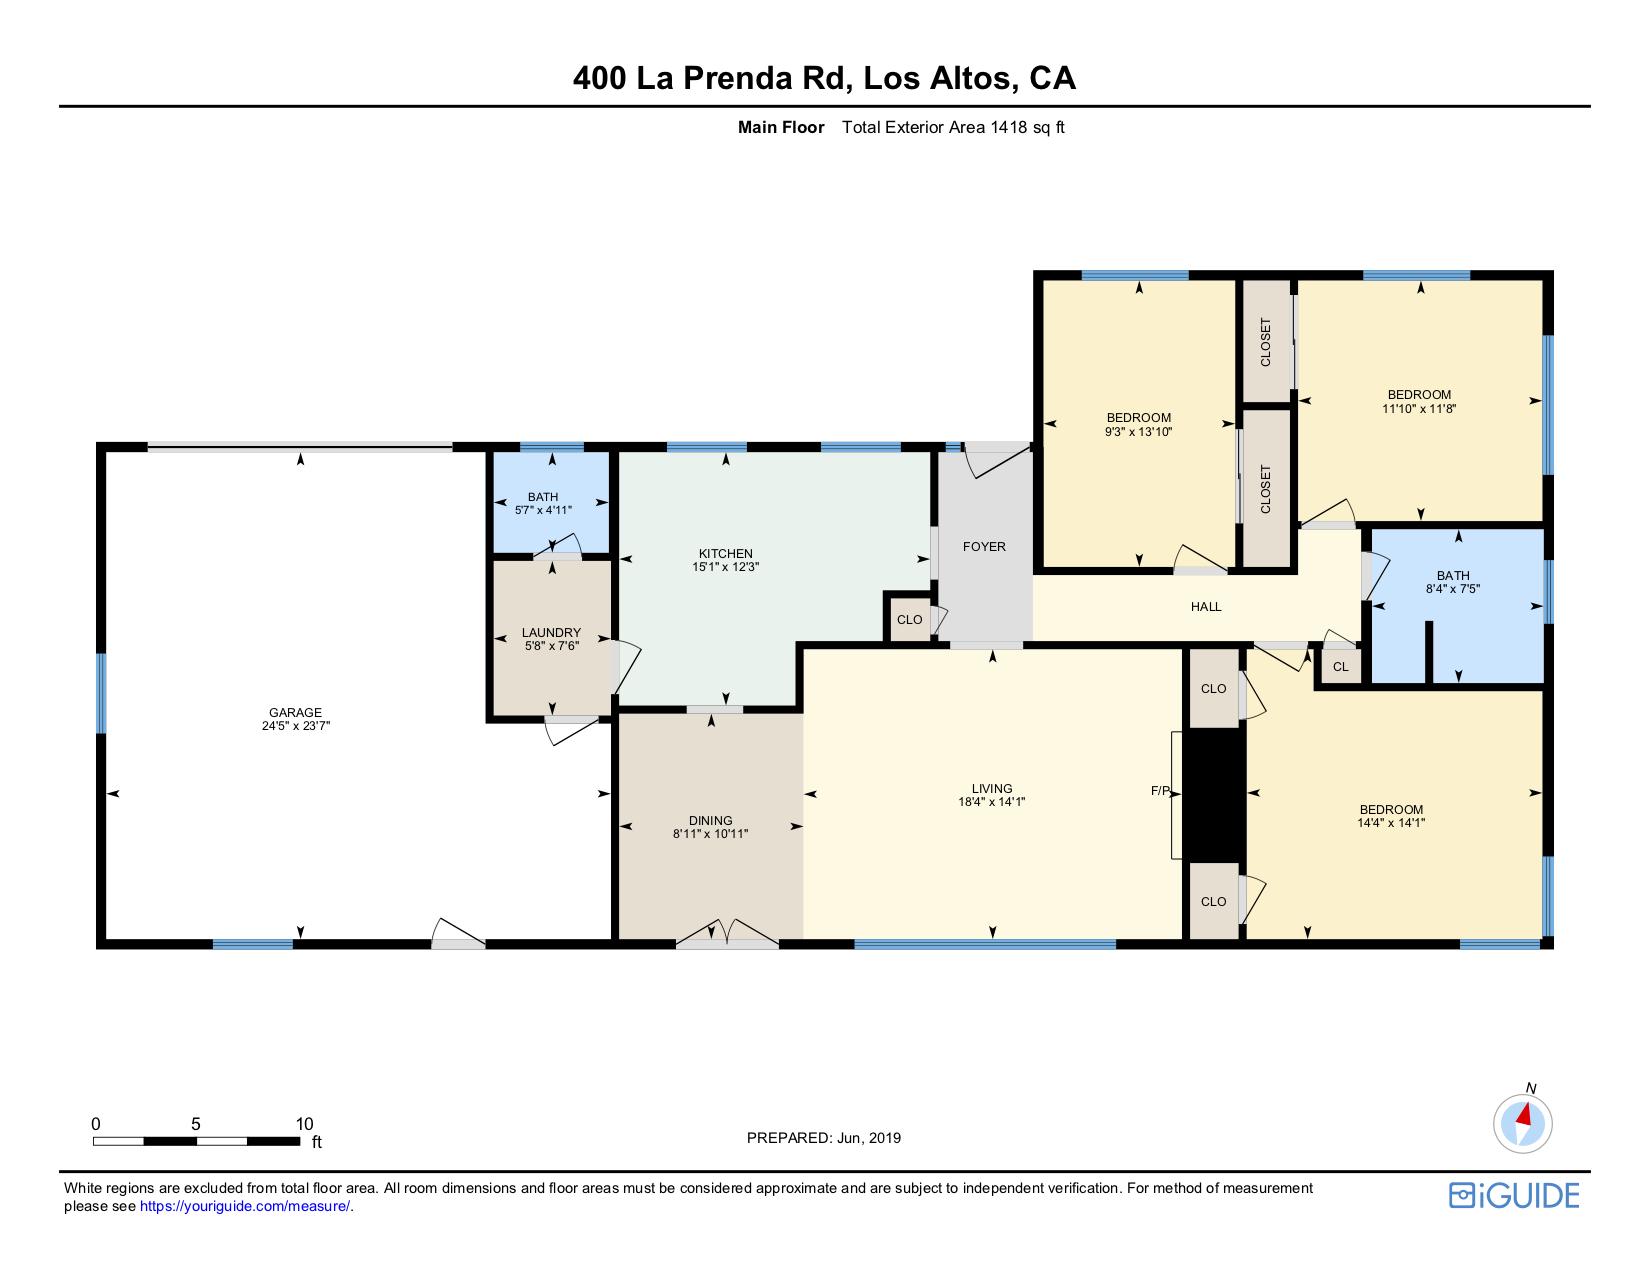 Floor plan and measurment.jpg